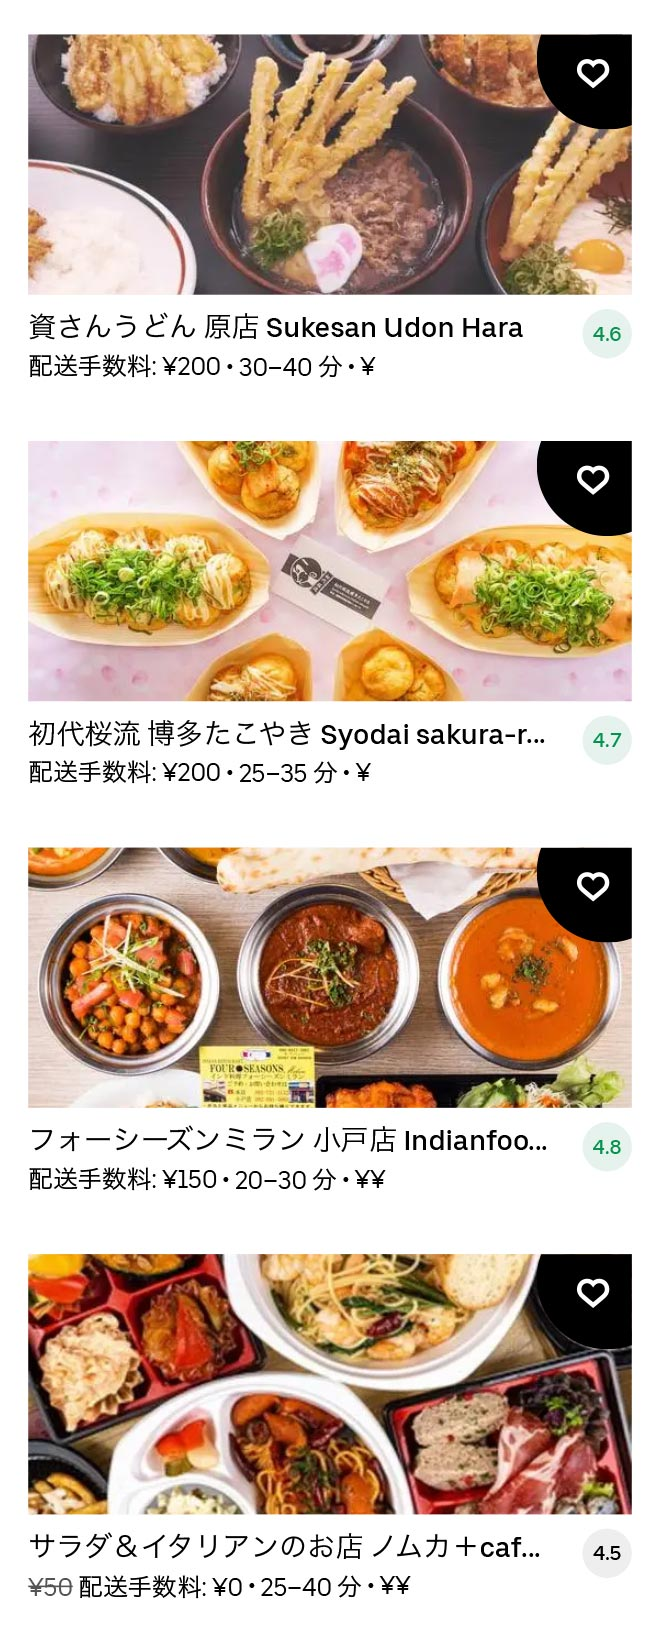 Meinohama menu 2101 08